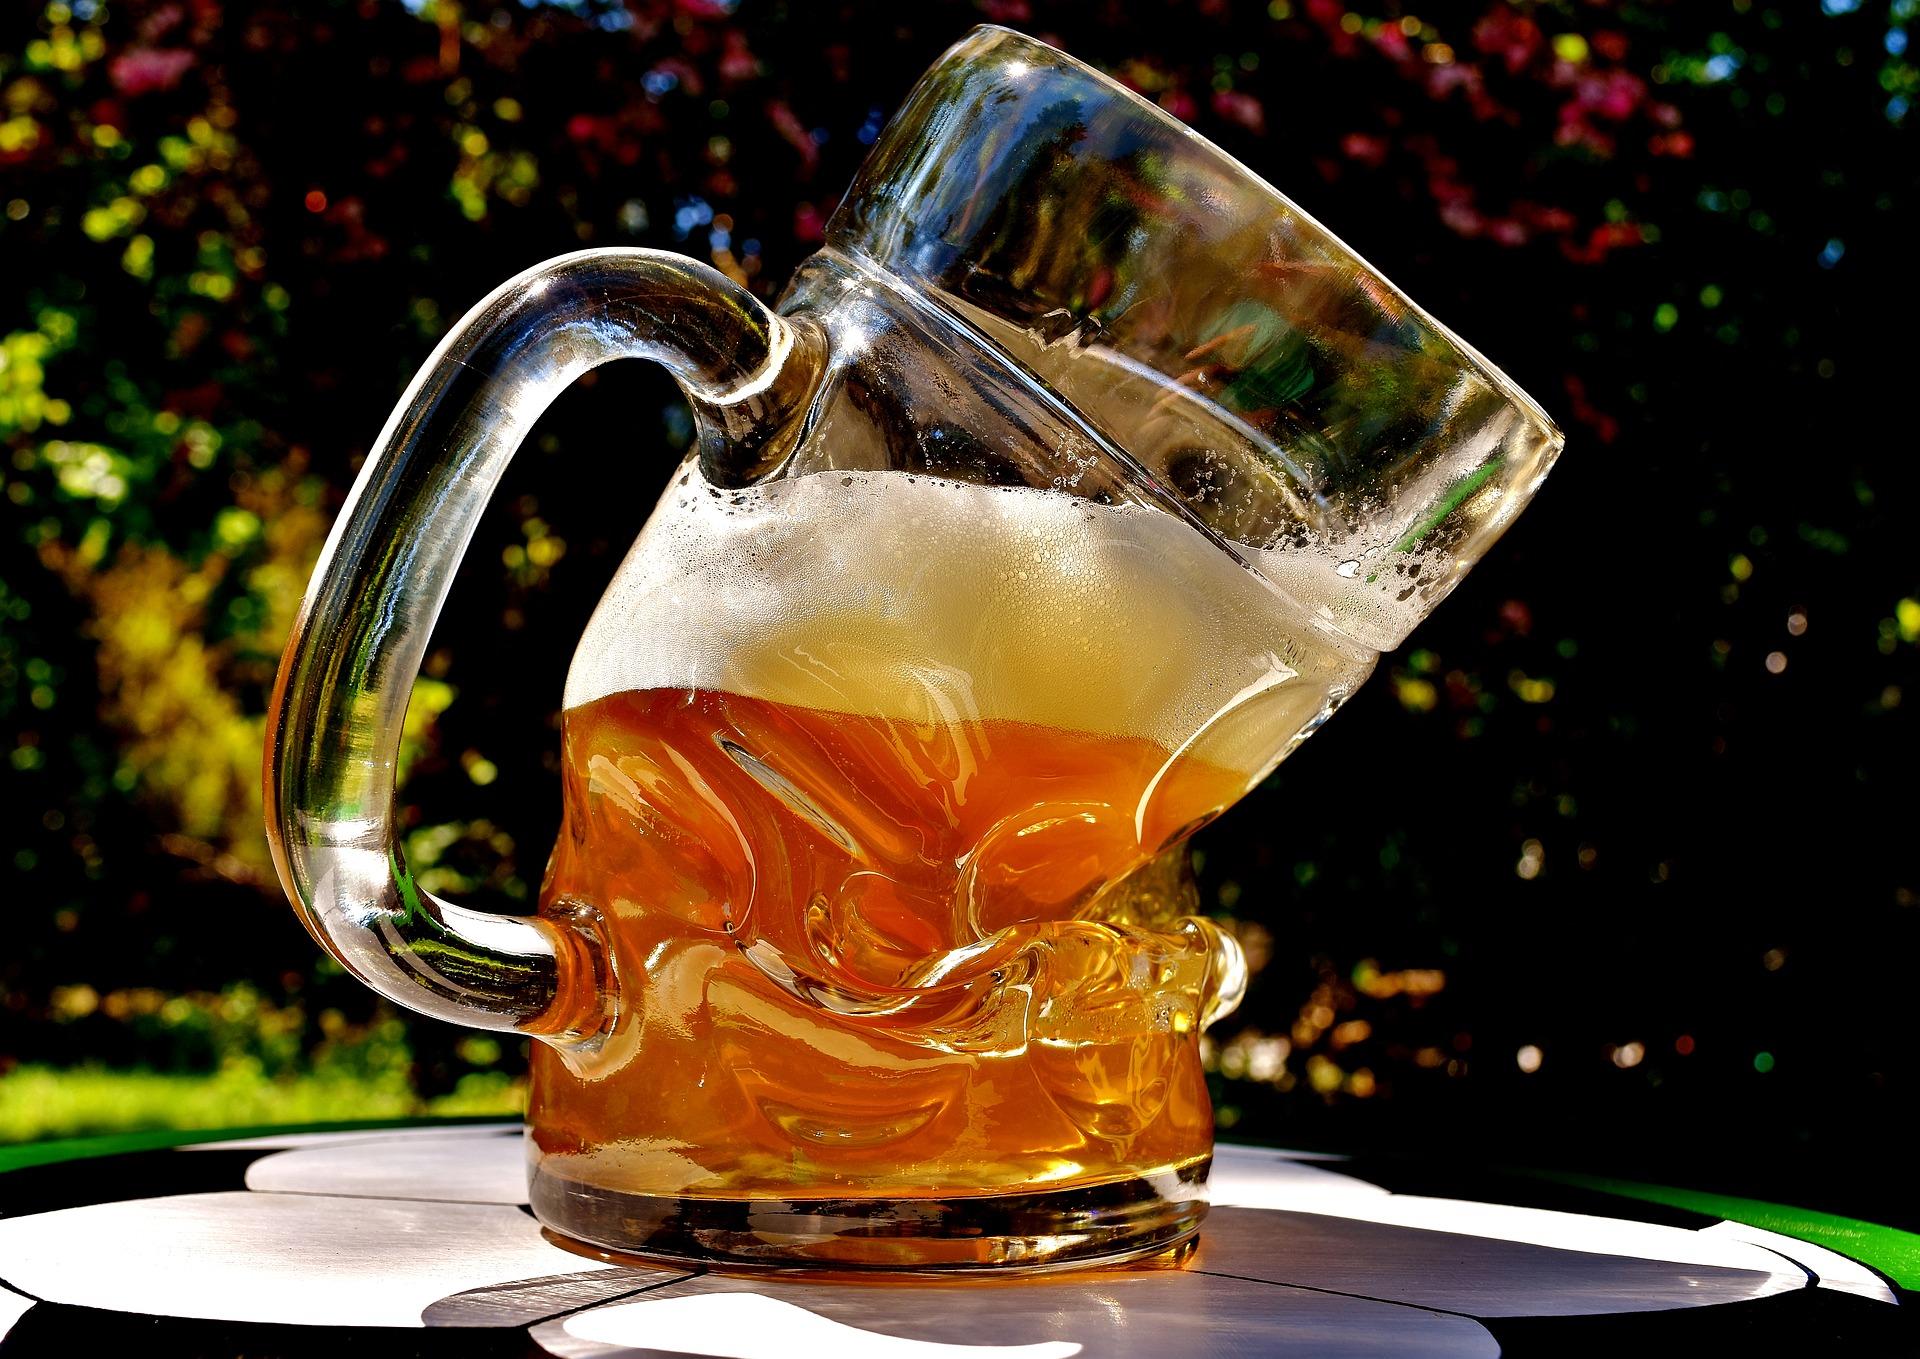 Bierverkoop daalt hard